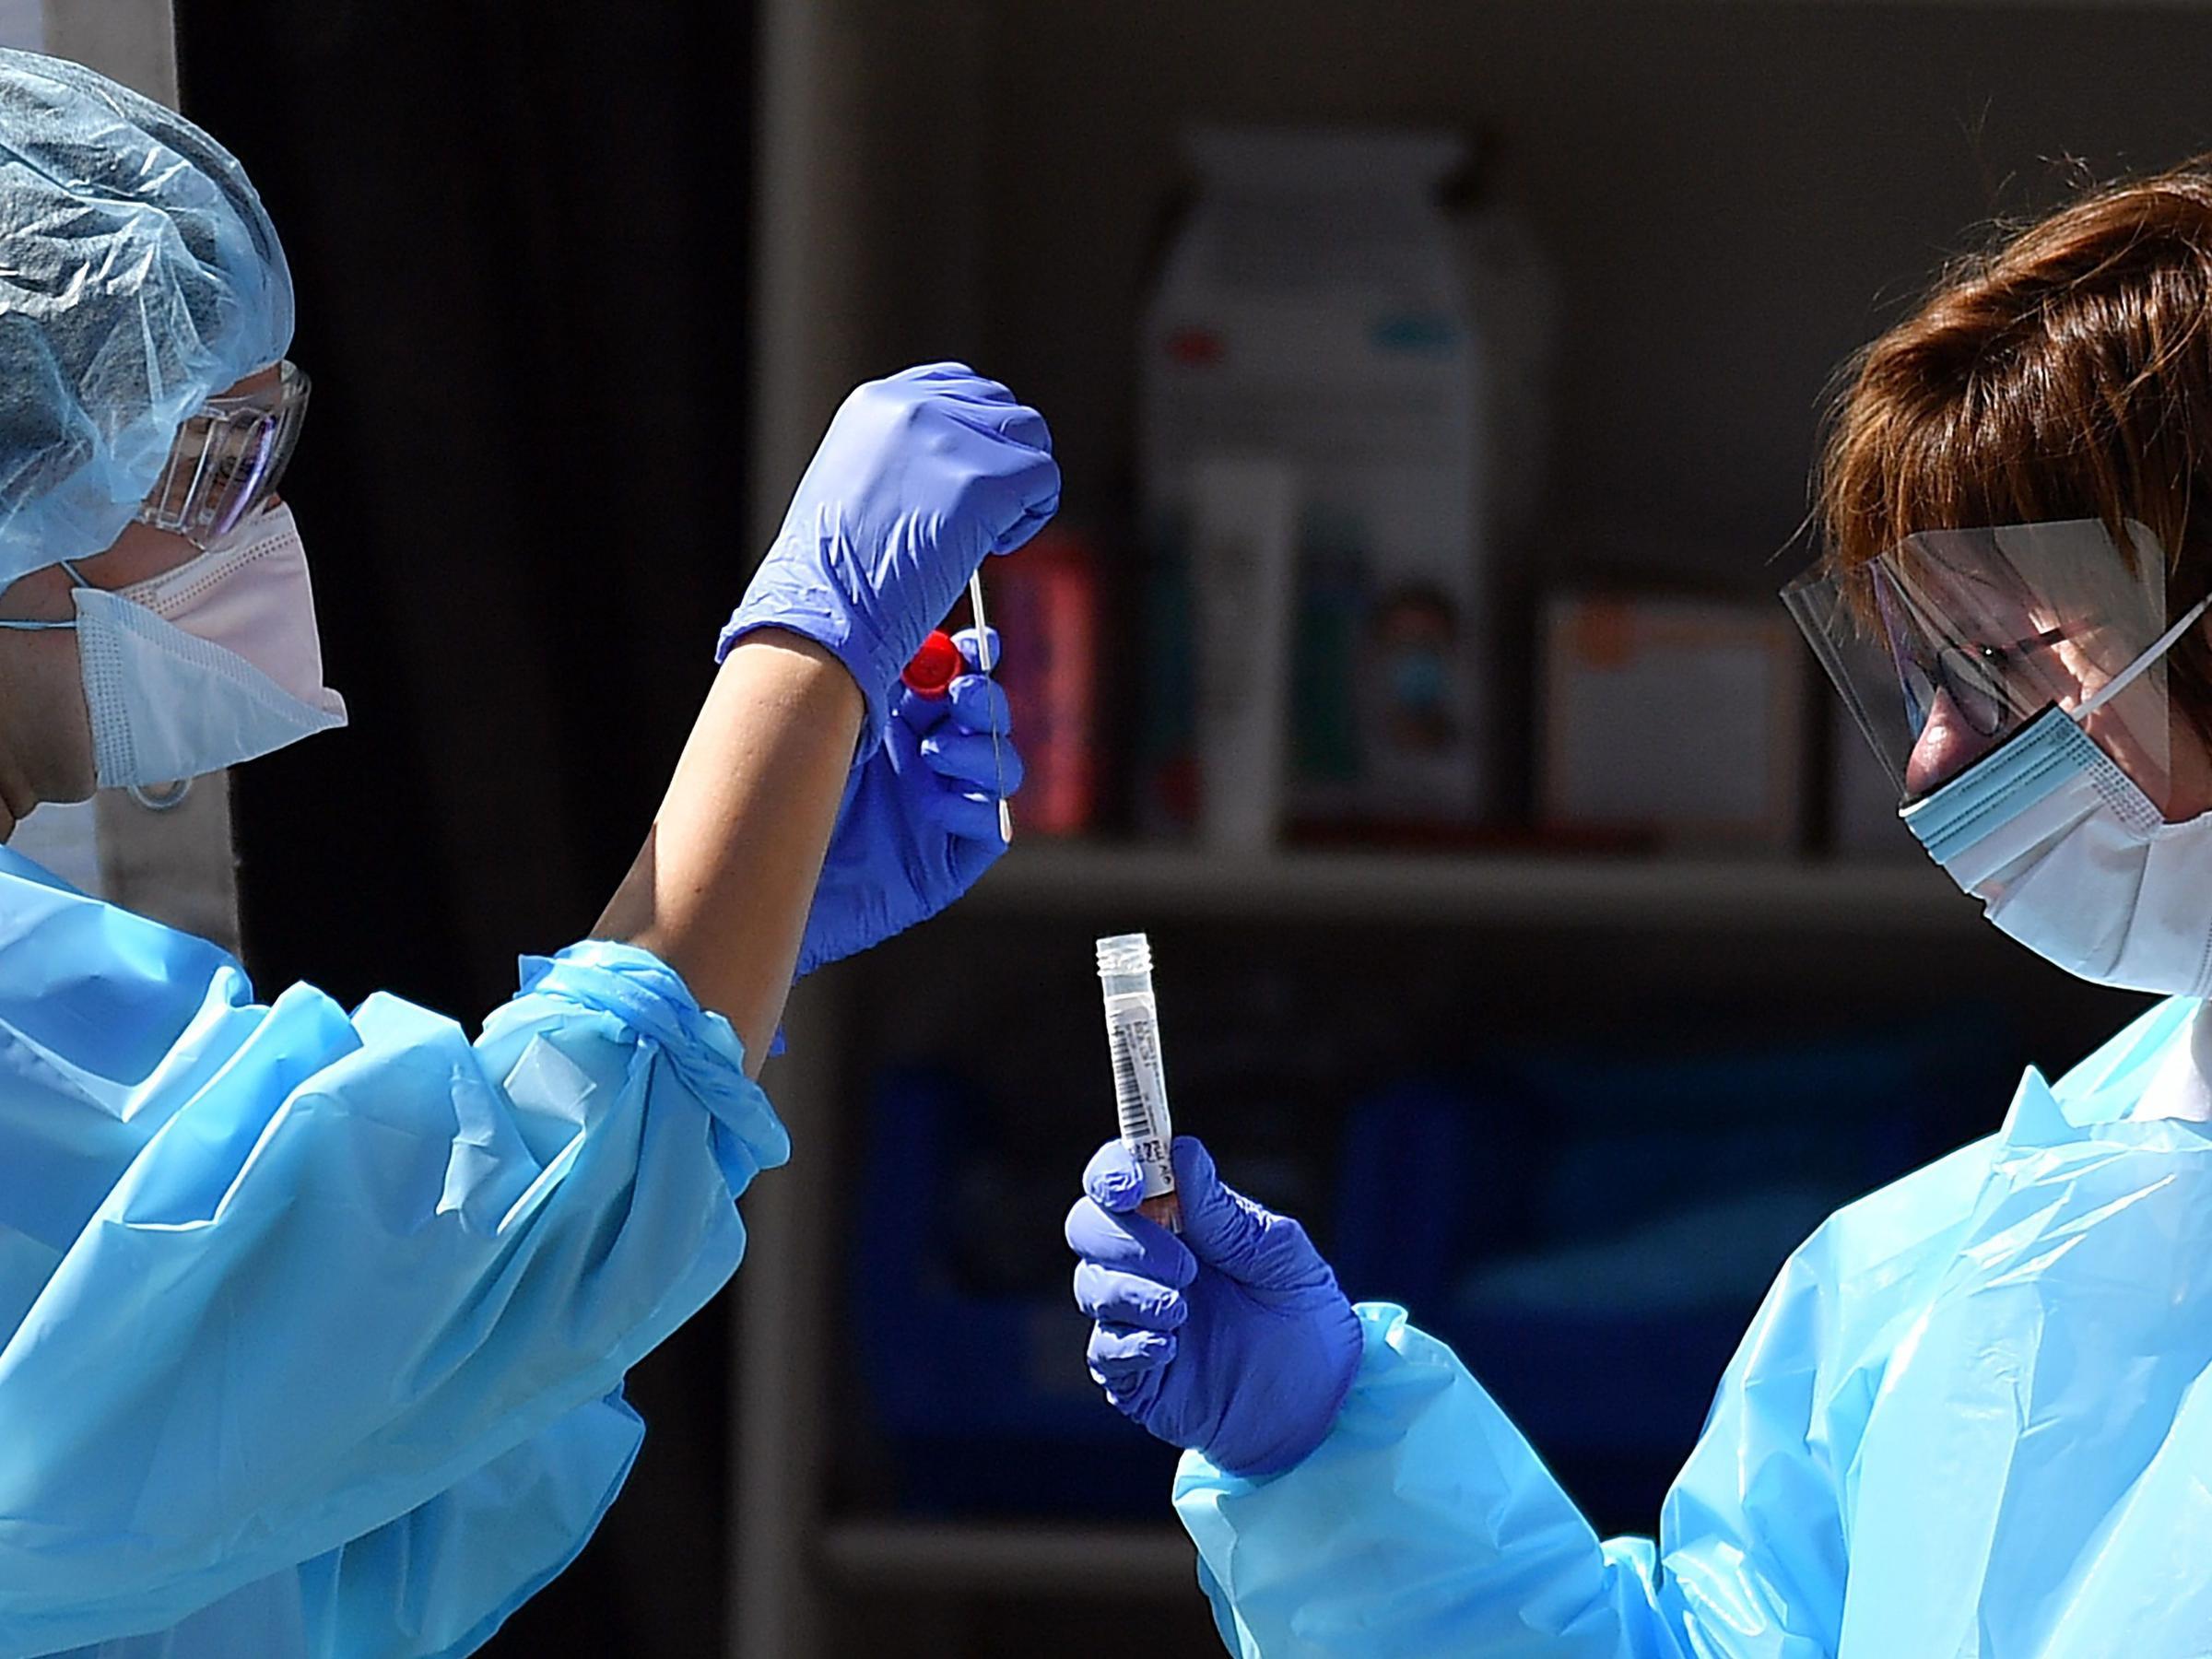 Global COVID-19 cases surpass 37 mln: Johns Hopkins University